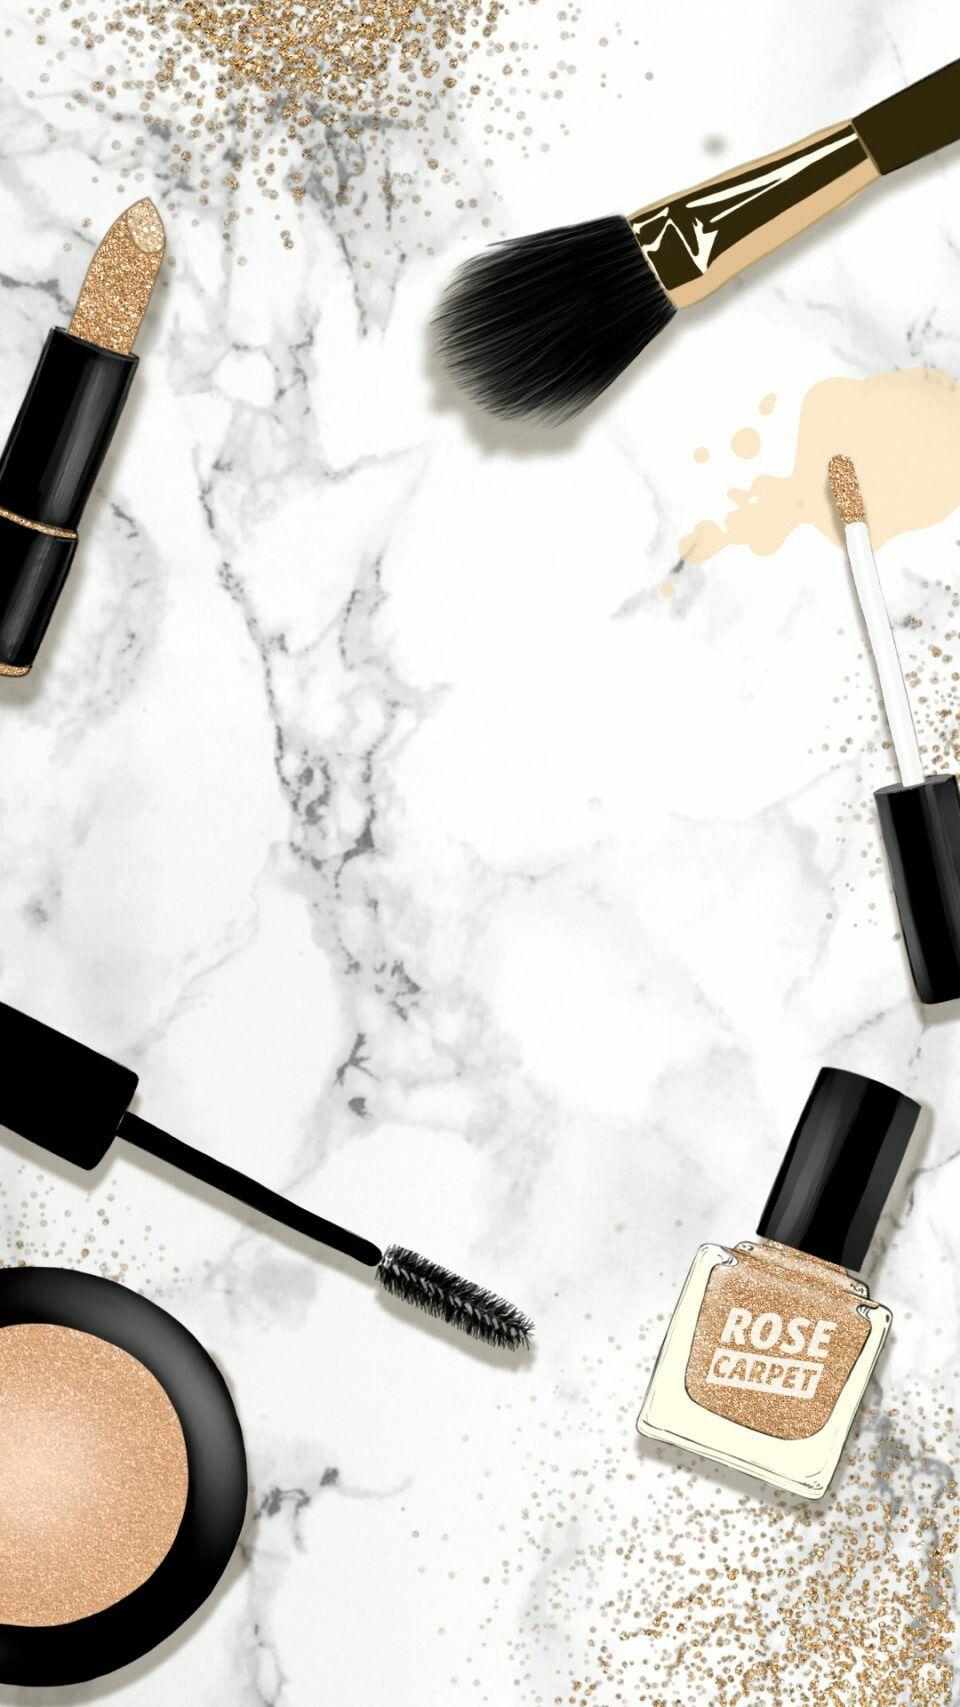 Pinterest: @EnchantedInPink♡ ♡ | Backgrounds in 2019 | Makeup wallpapers, Makeup backgrounds ...